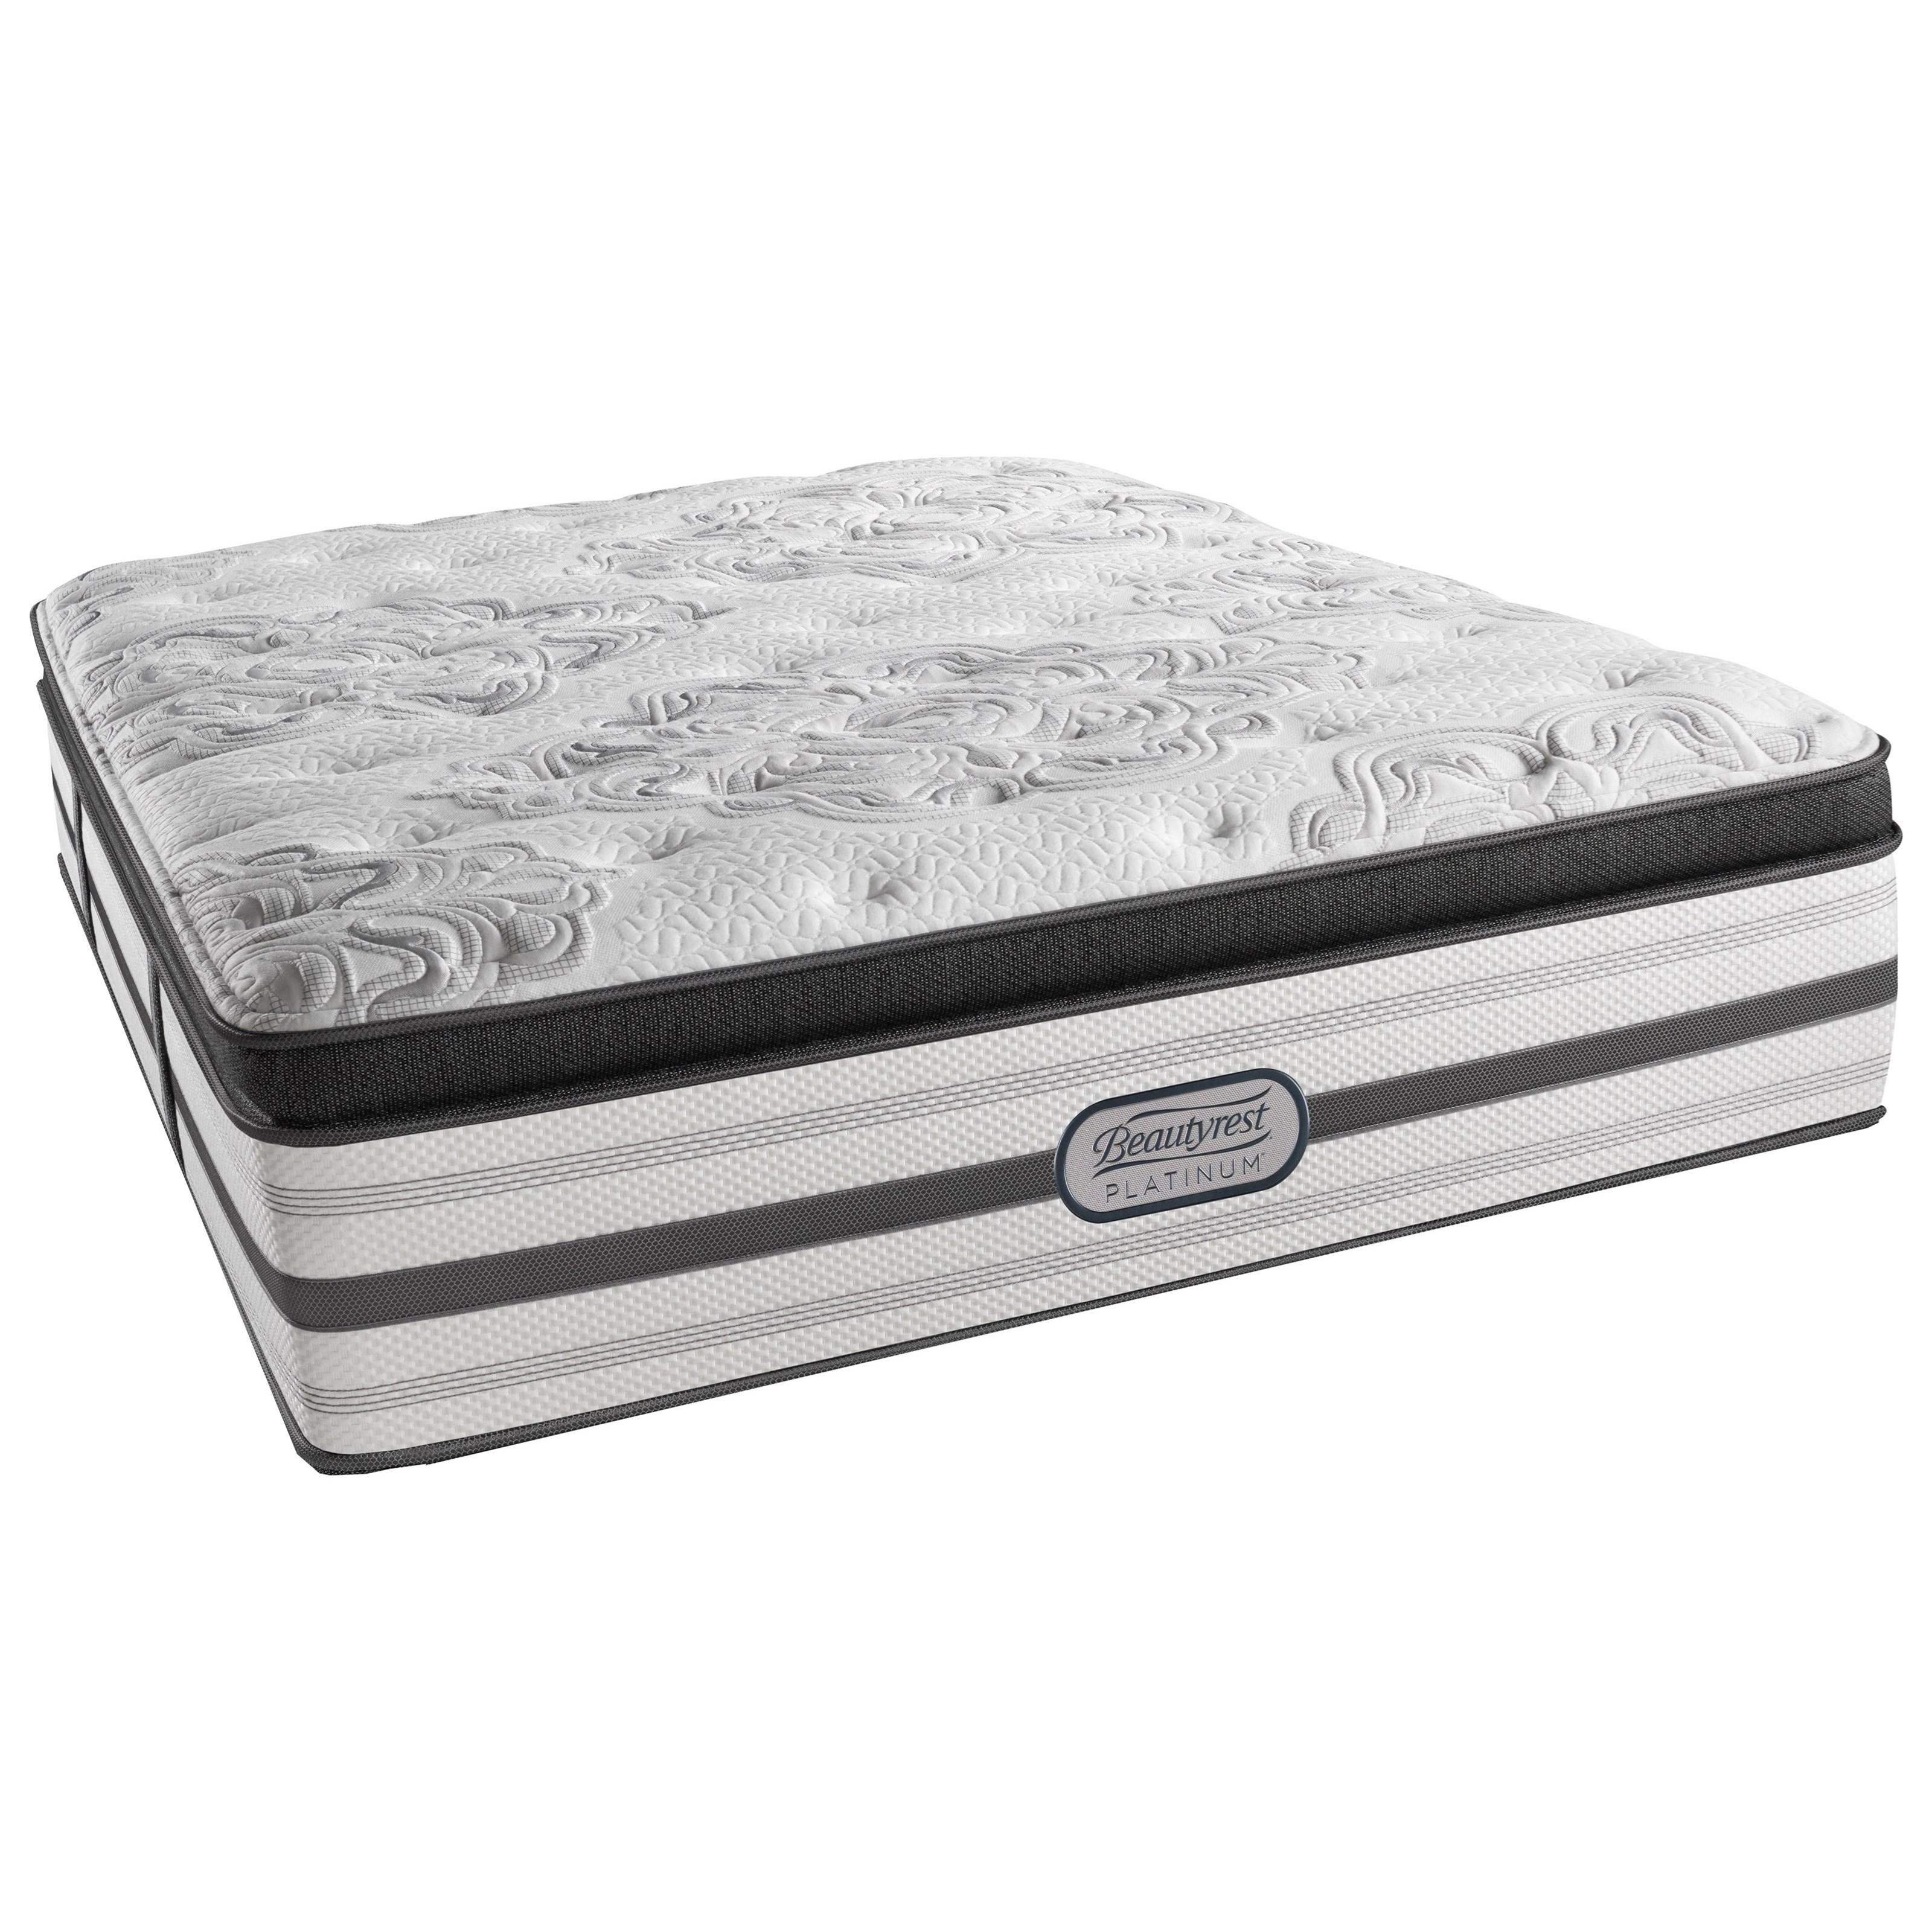 Beautyrest Platinum Katherine King Plush Box Top Mattress - Item Number: LV4PLBT-K